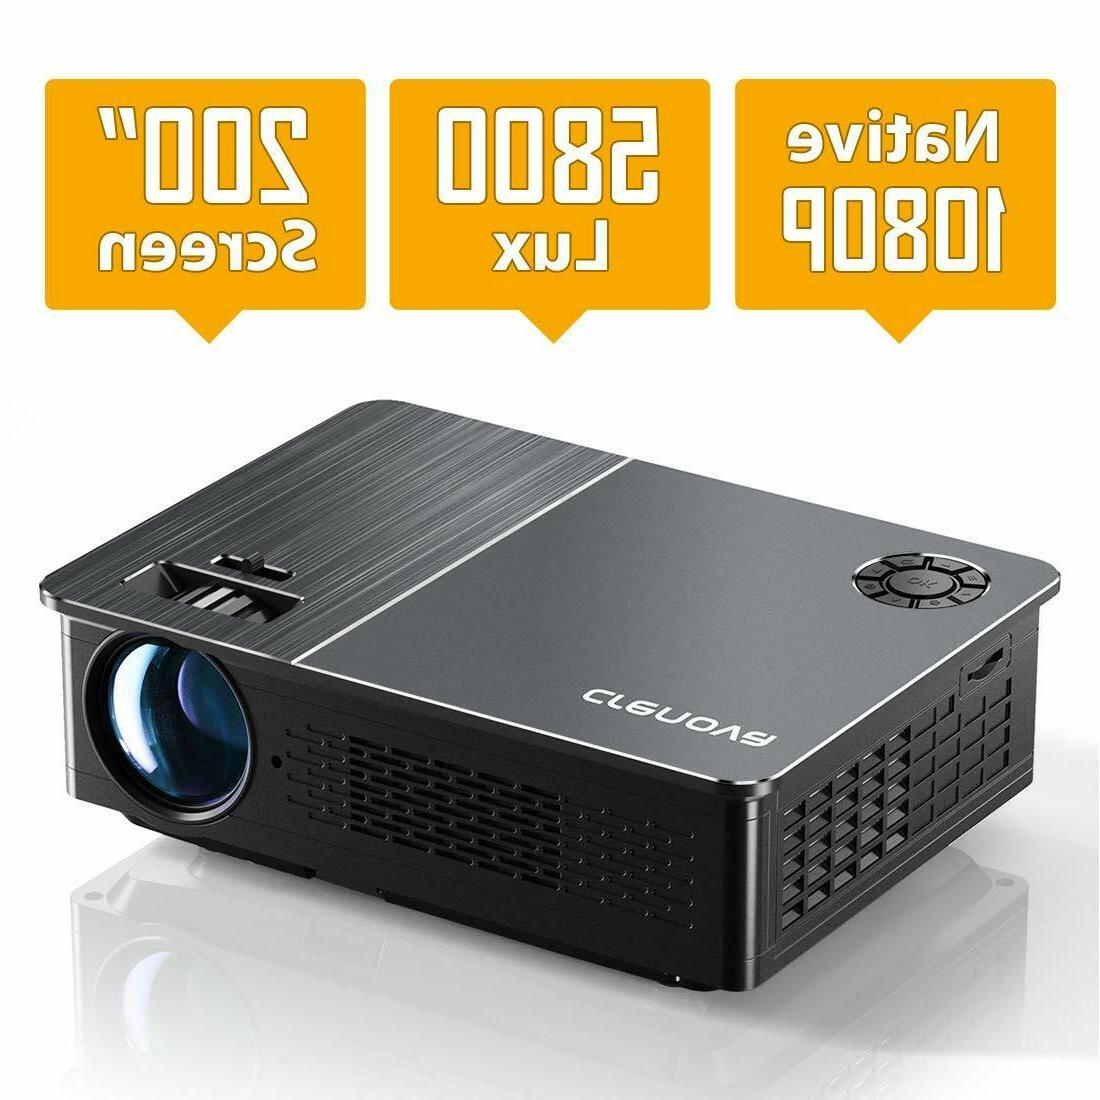 Projector, WiMiUS P20 1080P LED 6500 Lumen Video Projector